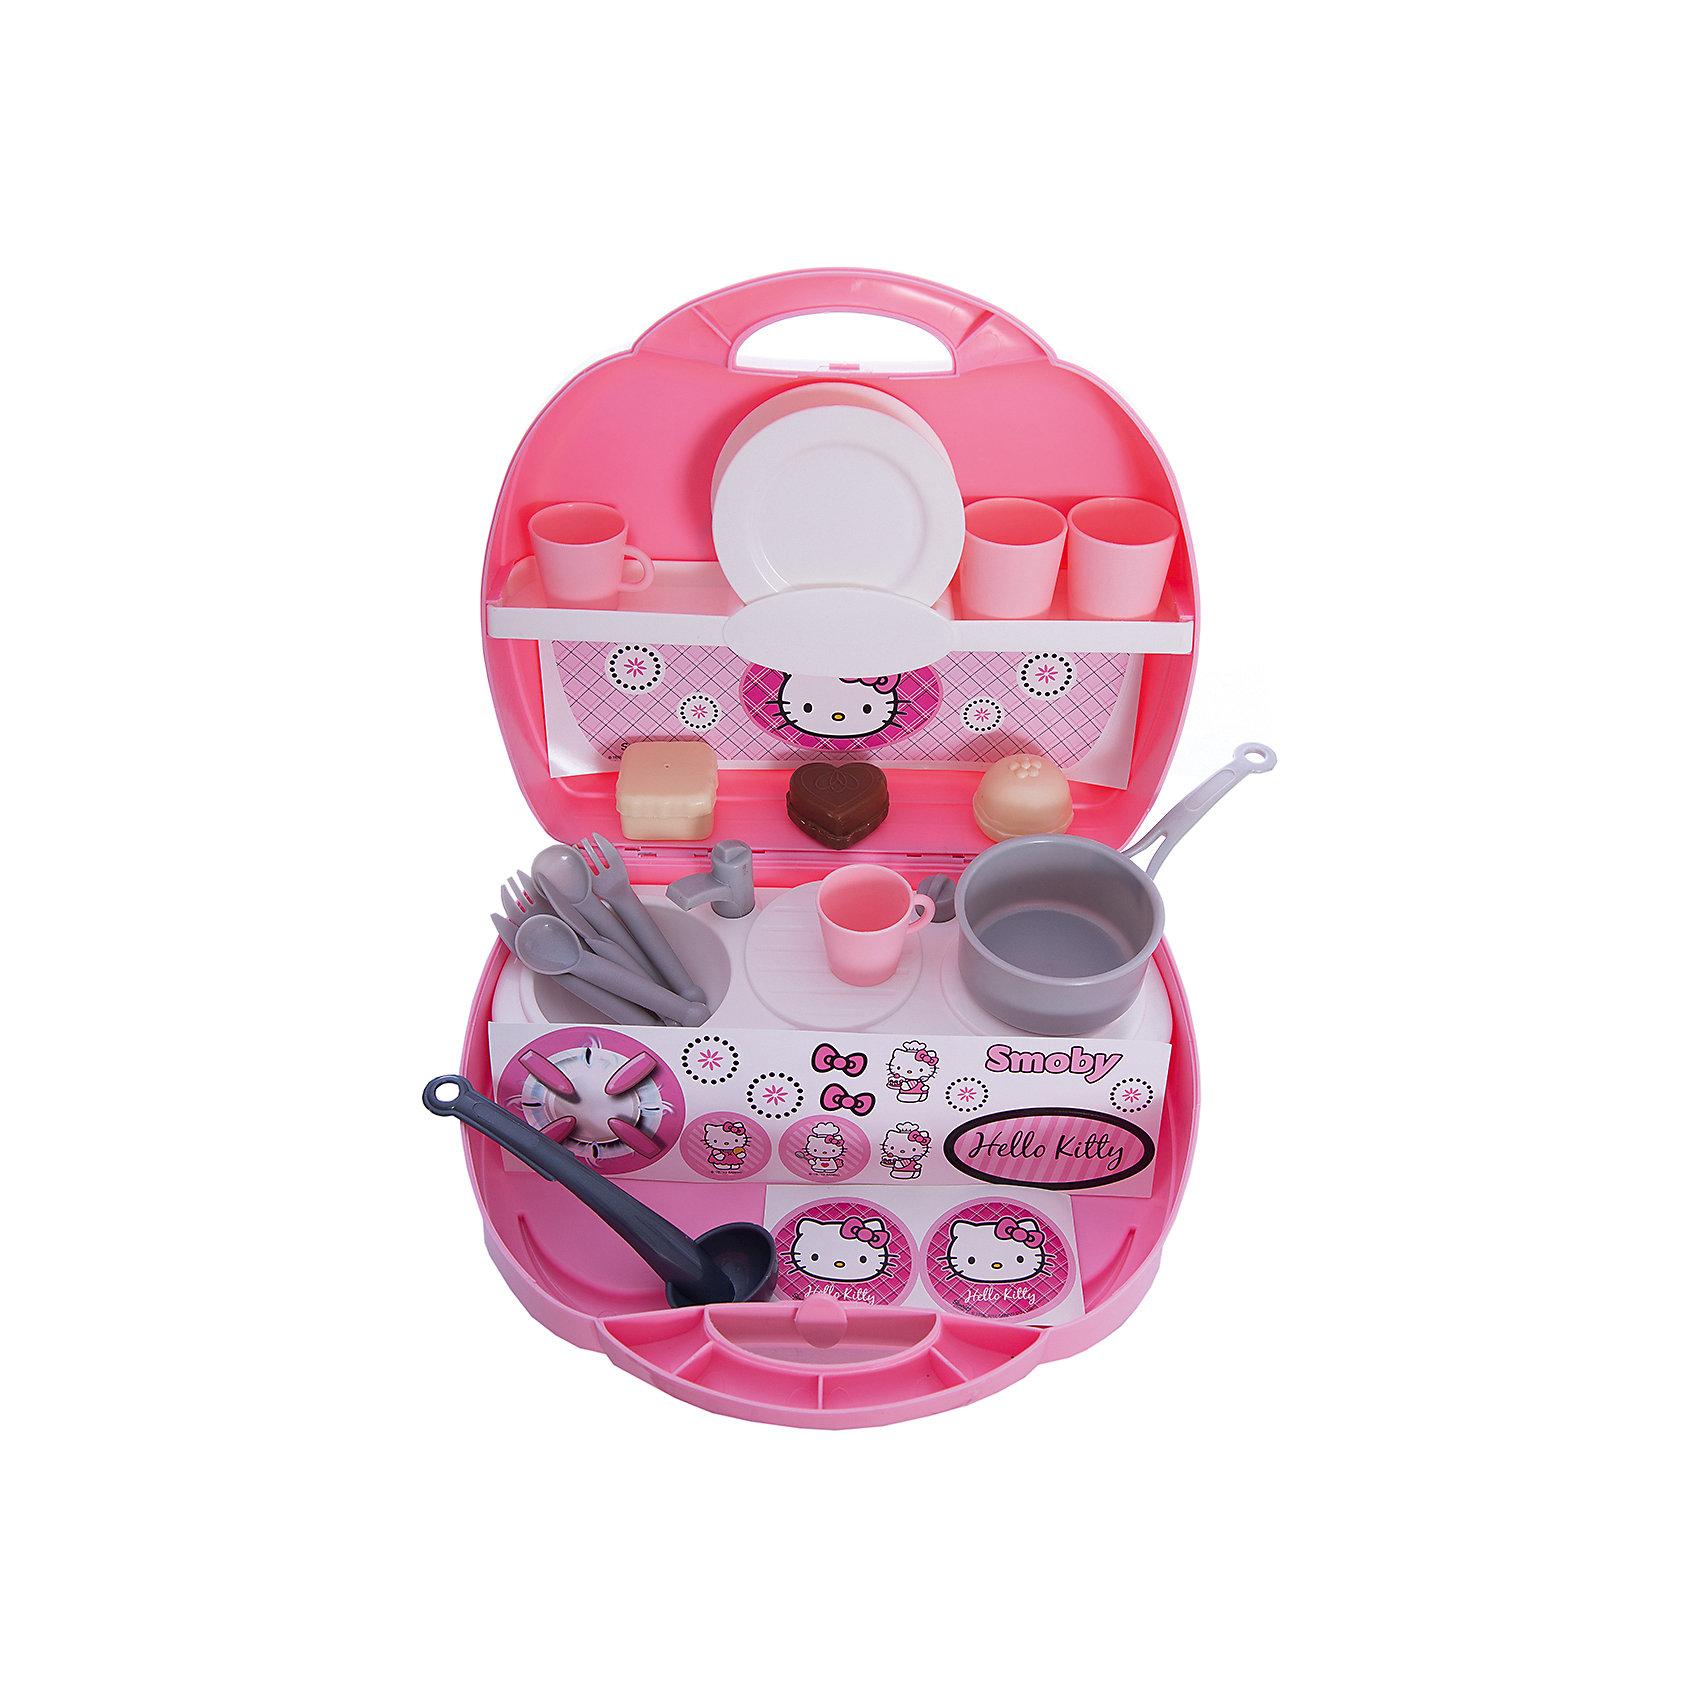 Smoby Мини-кухня в чемоданчике Hello Kitty, 25,5*22,5*10 см, Smoby smoby hello kitty кухня 60х31х58 см с аксессуарами